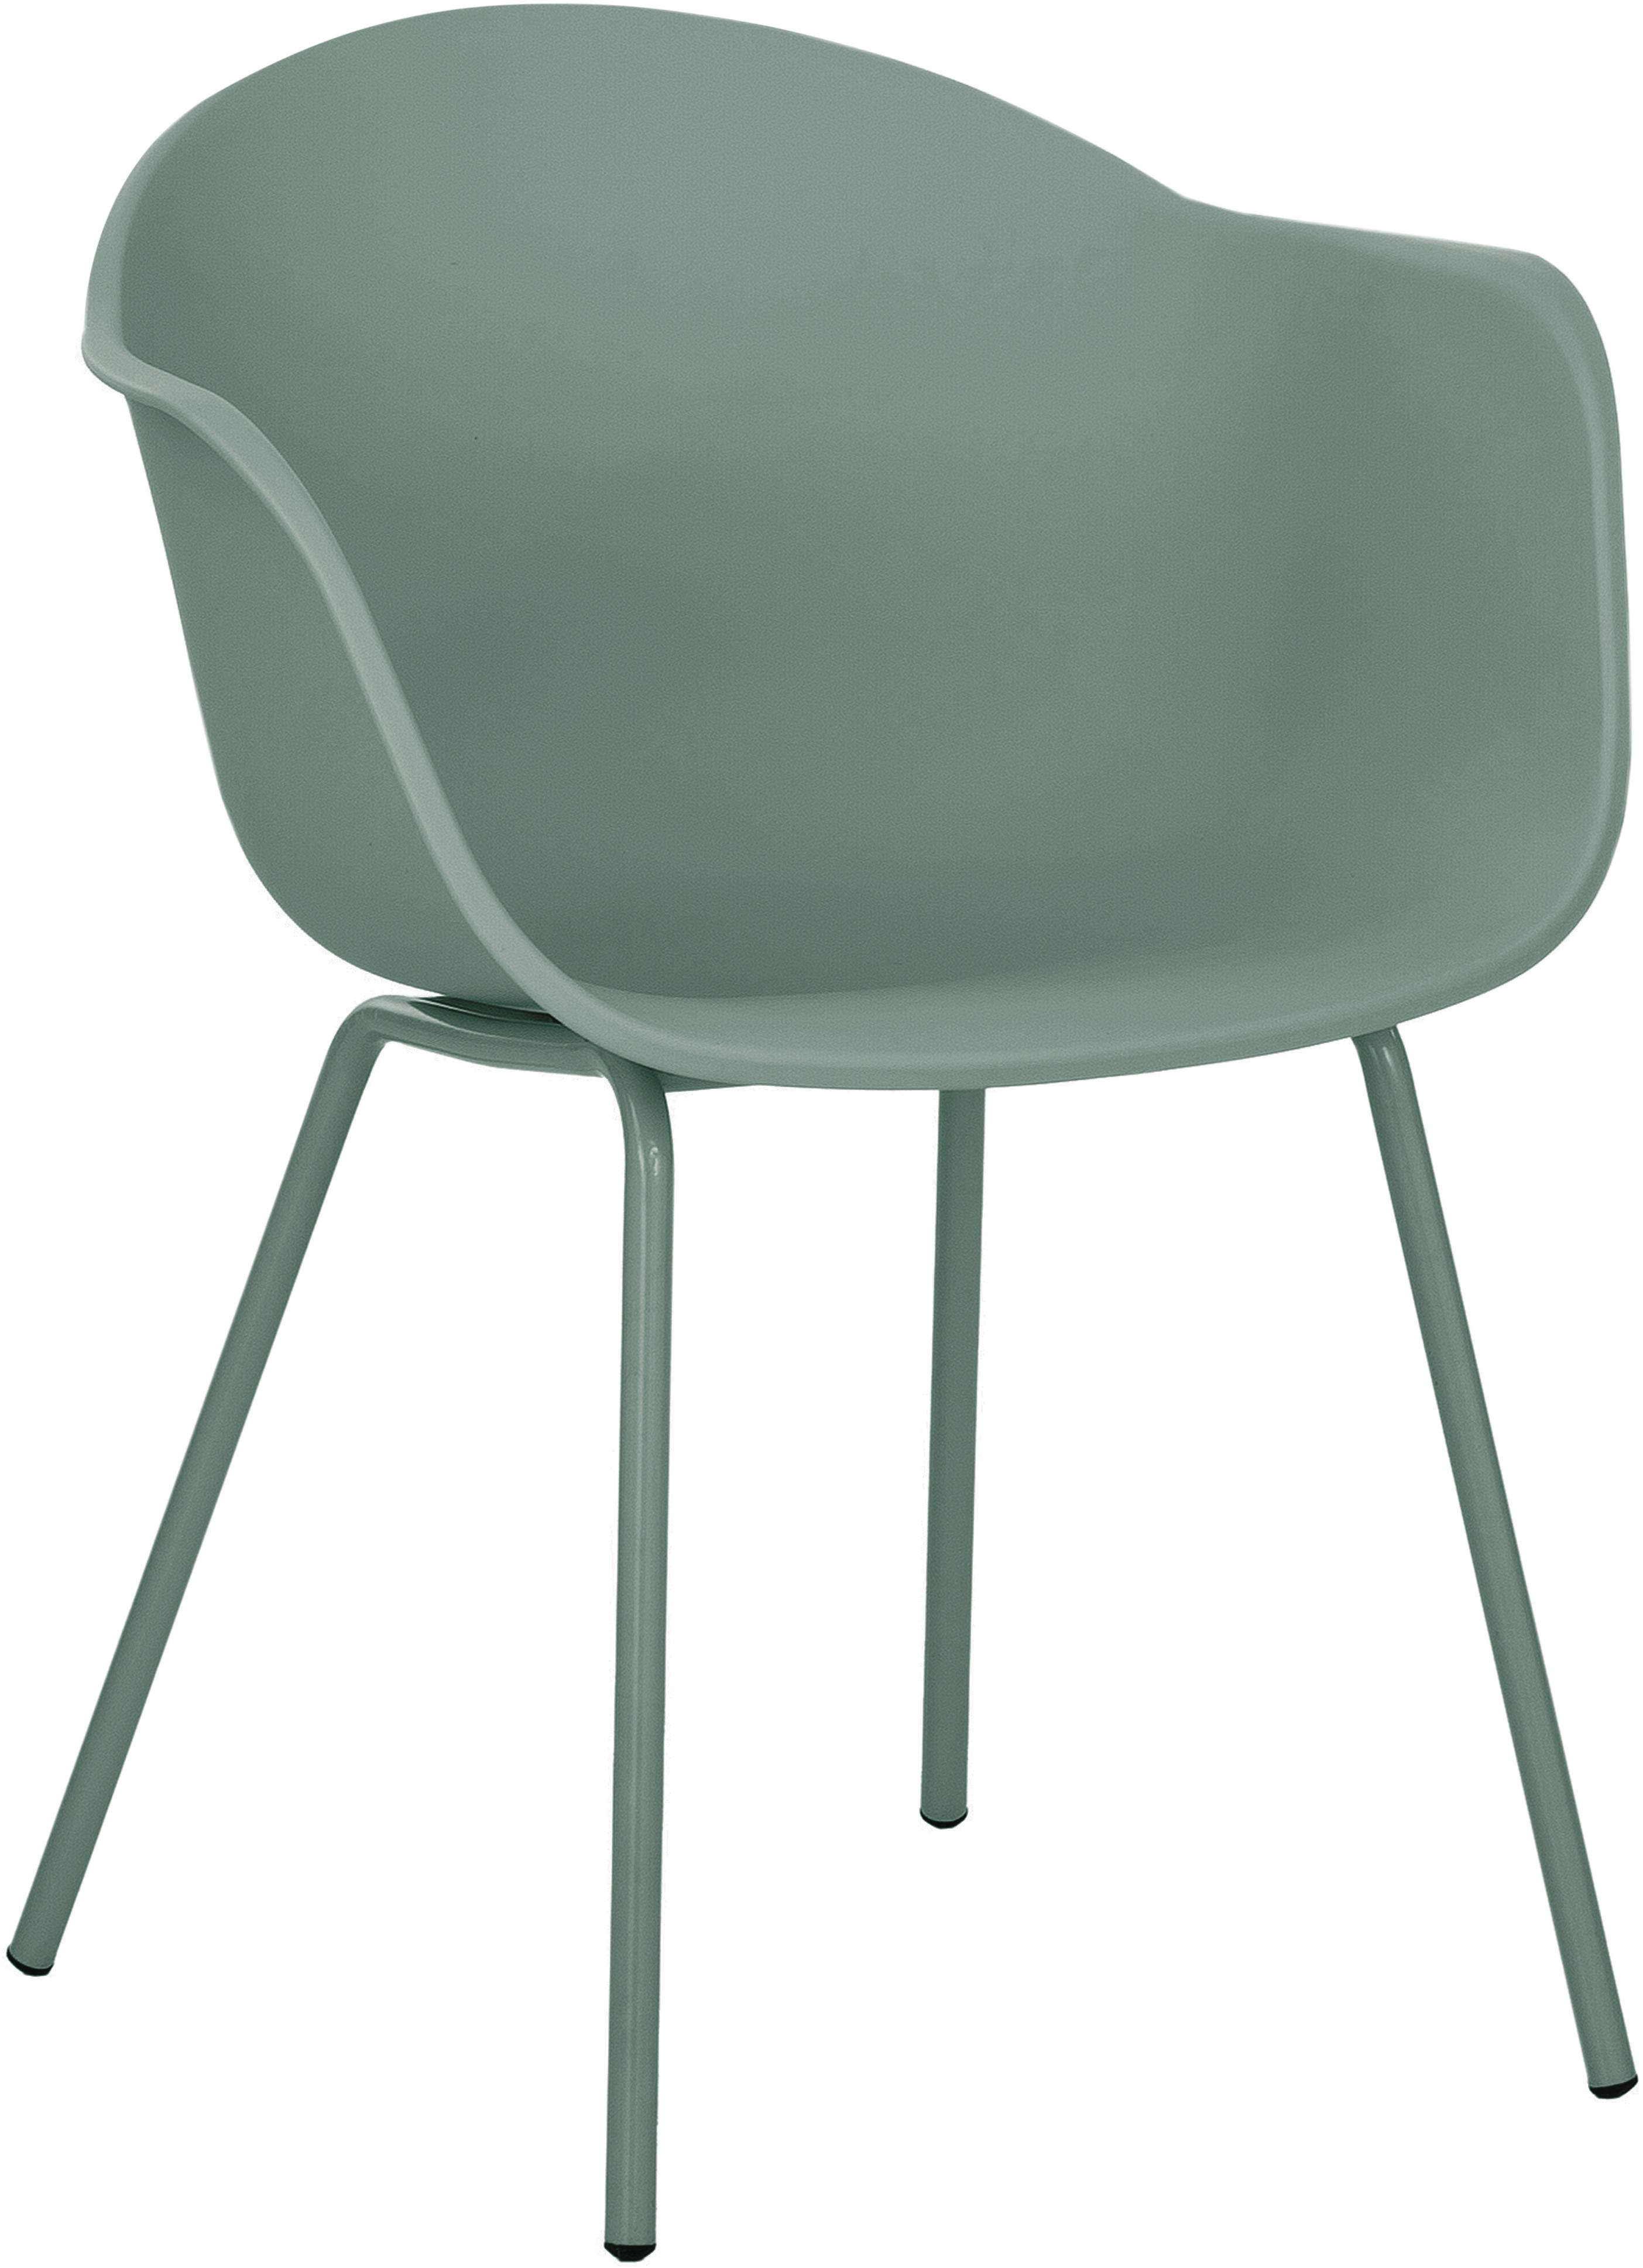 Silla con reposabrazos Claire, Asiento: plástico, Patas: metal con pintura en polv, Verde, An 54 x F 60 cm